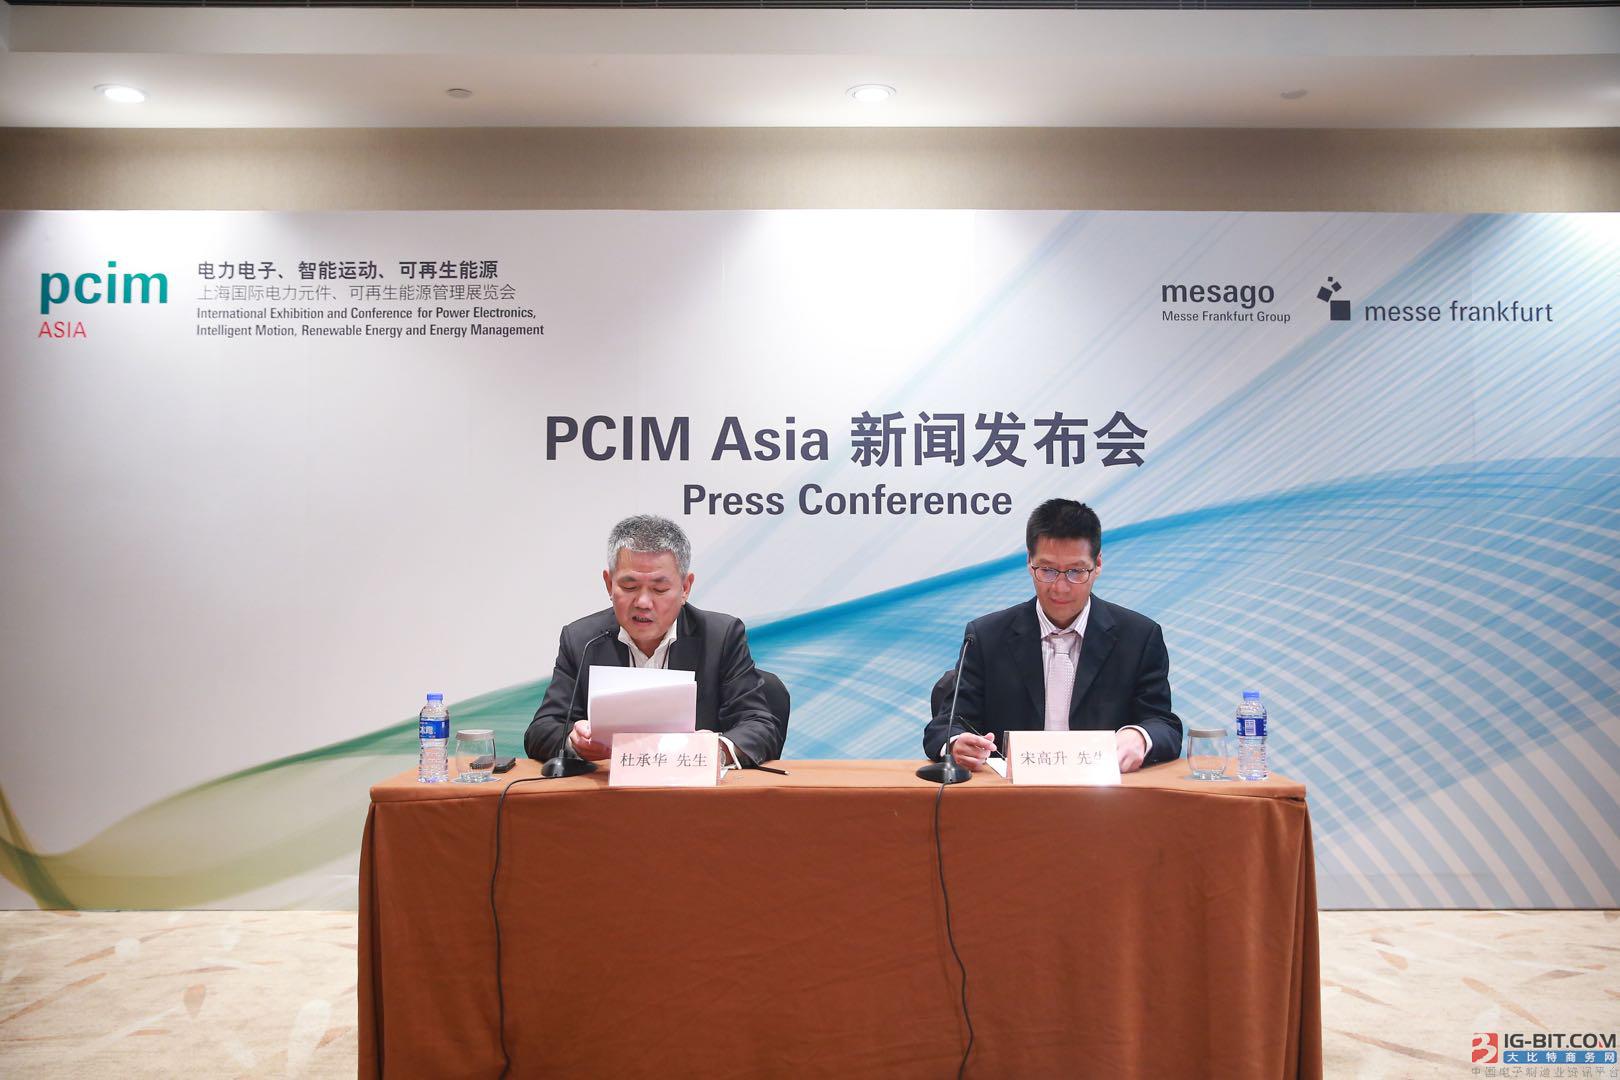 PCIM Asia 2018 汇聚全球知名参展商,新能源汽车技术专区首度亮相